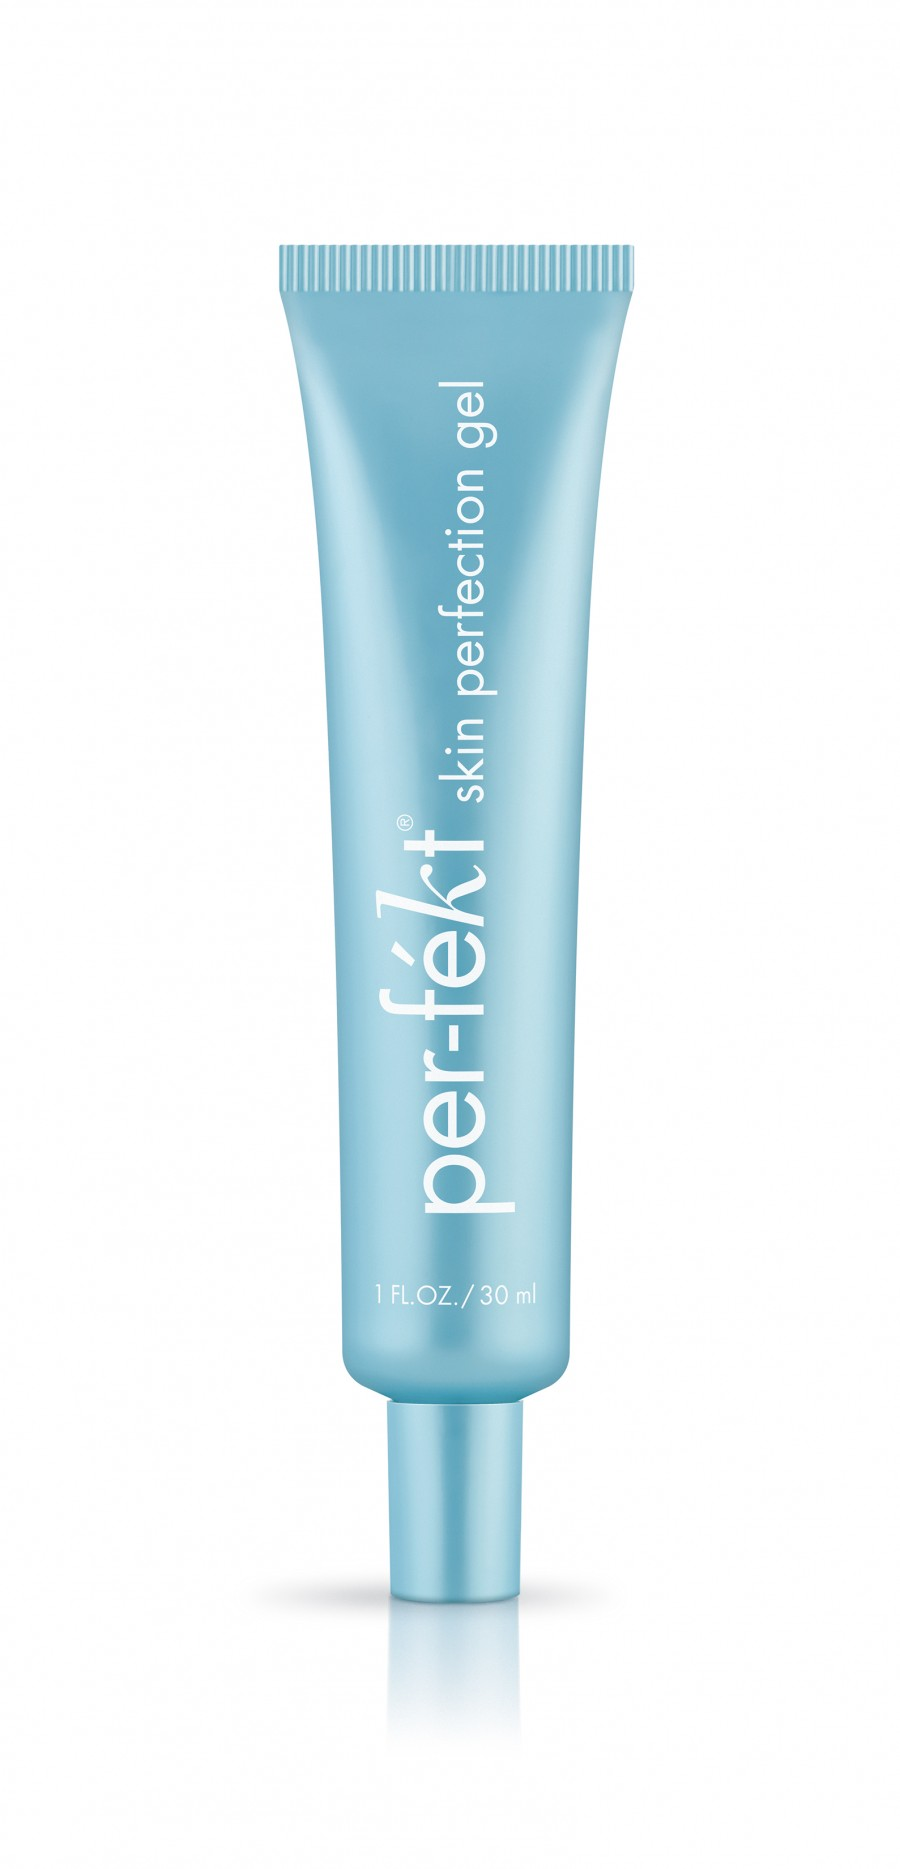 Makeup Spotlight: Perfekt Skin Perfection Gel | LATF USA